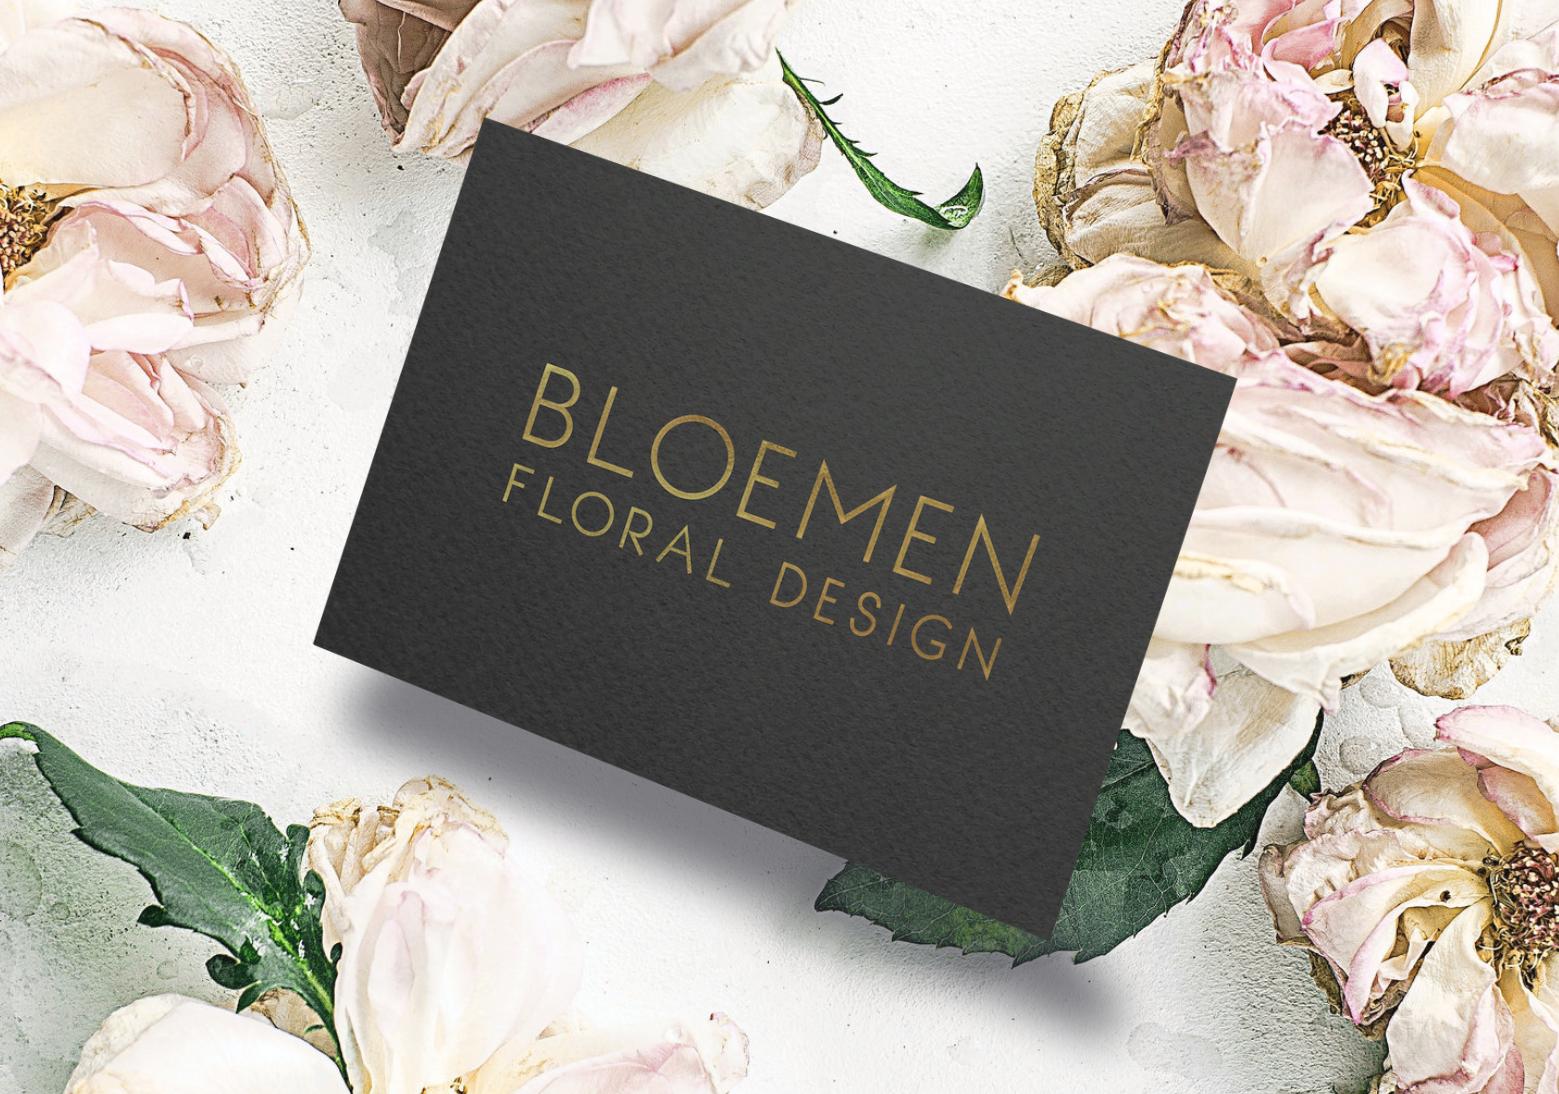 Bloemen Floral Design.png